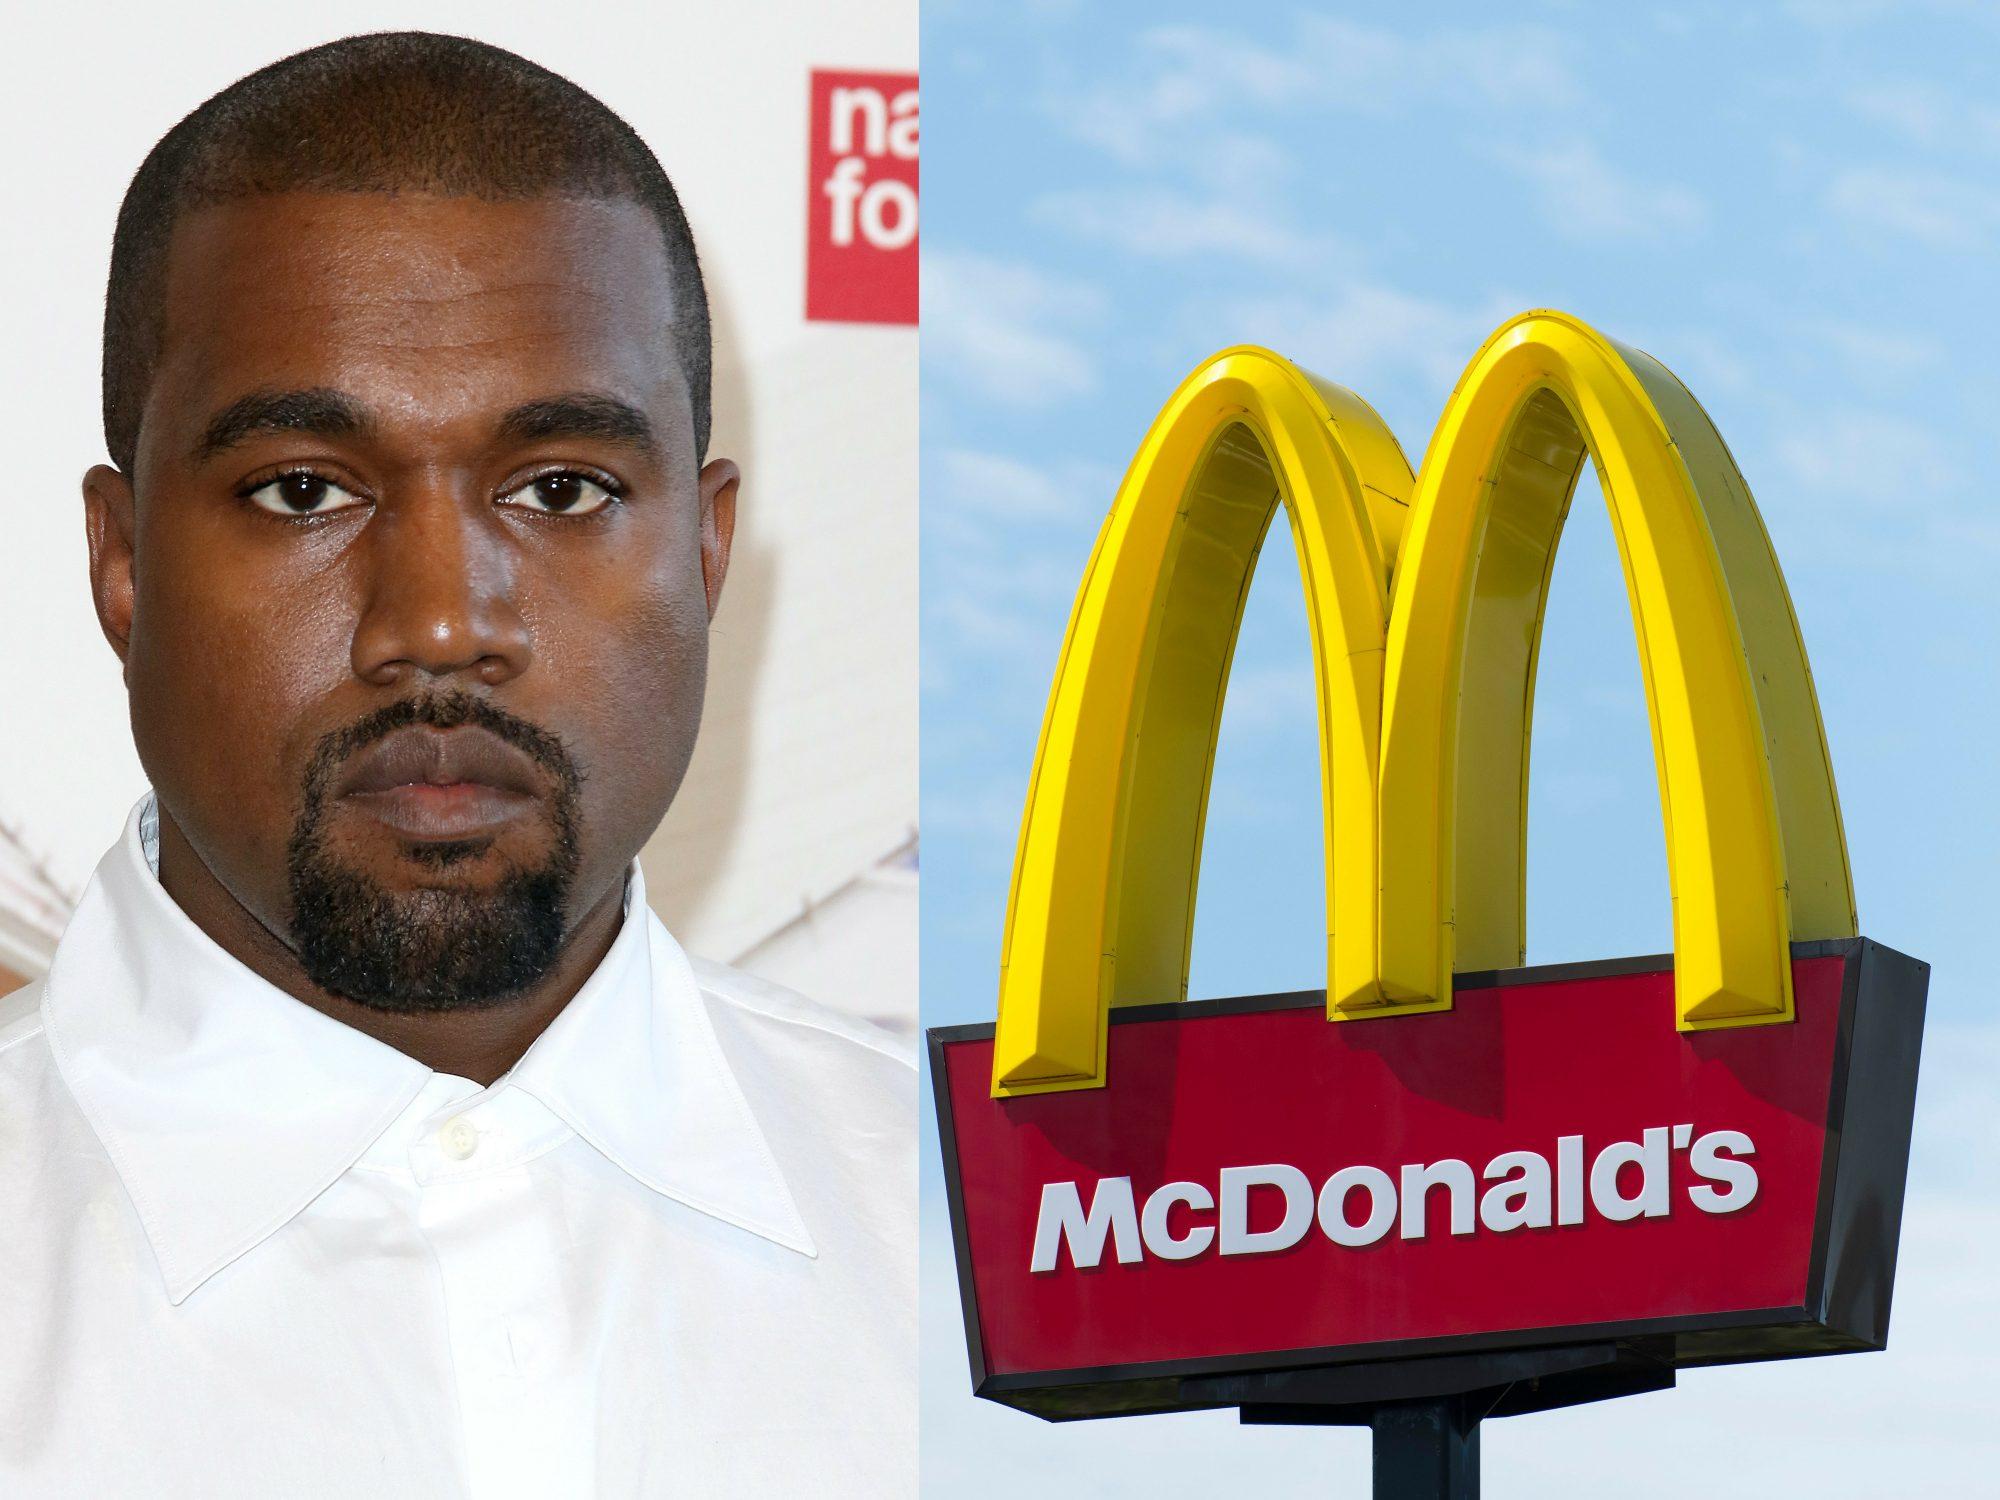 Kanye and McDonald's